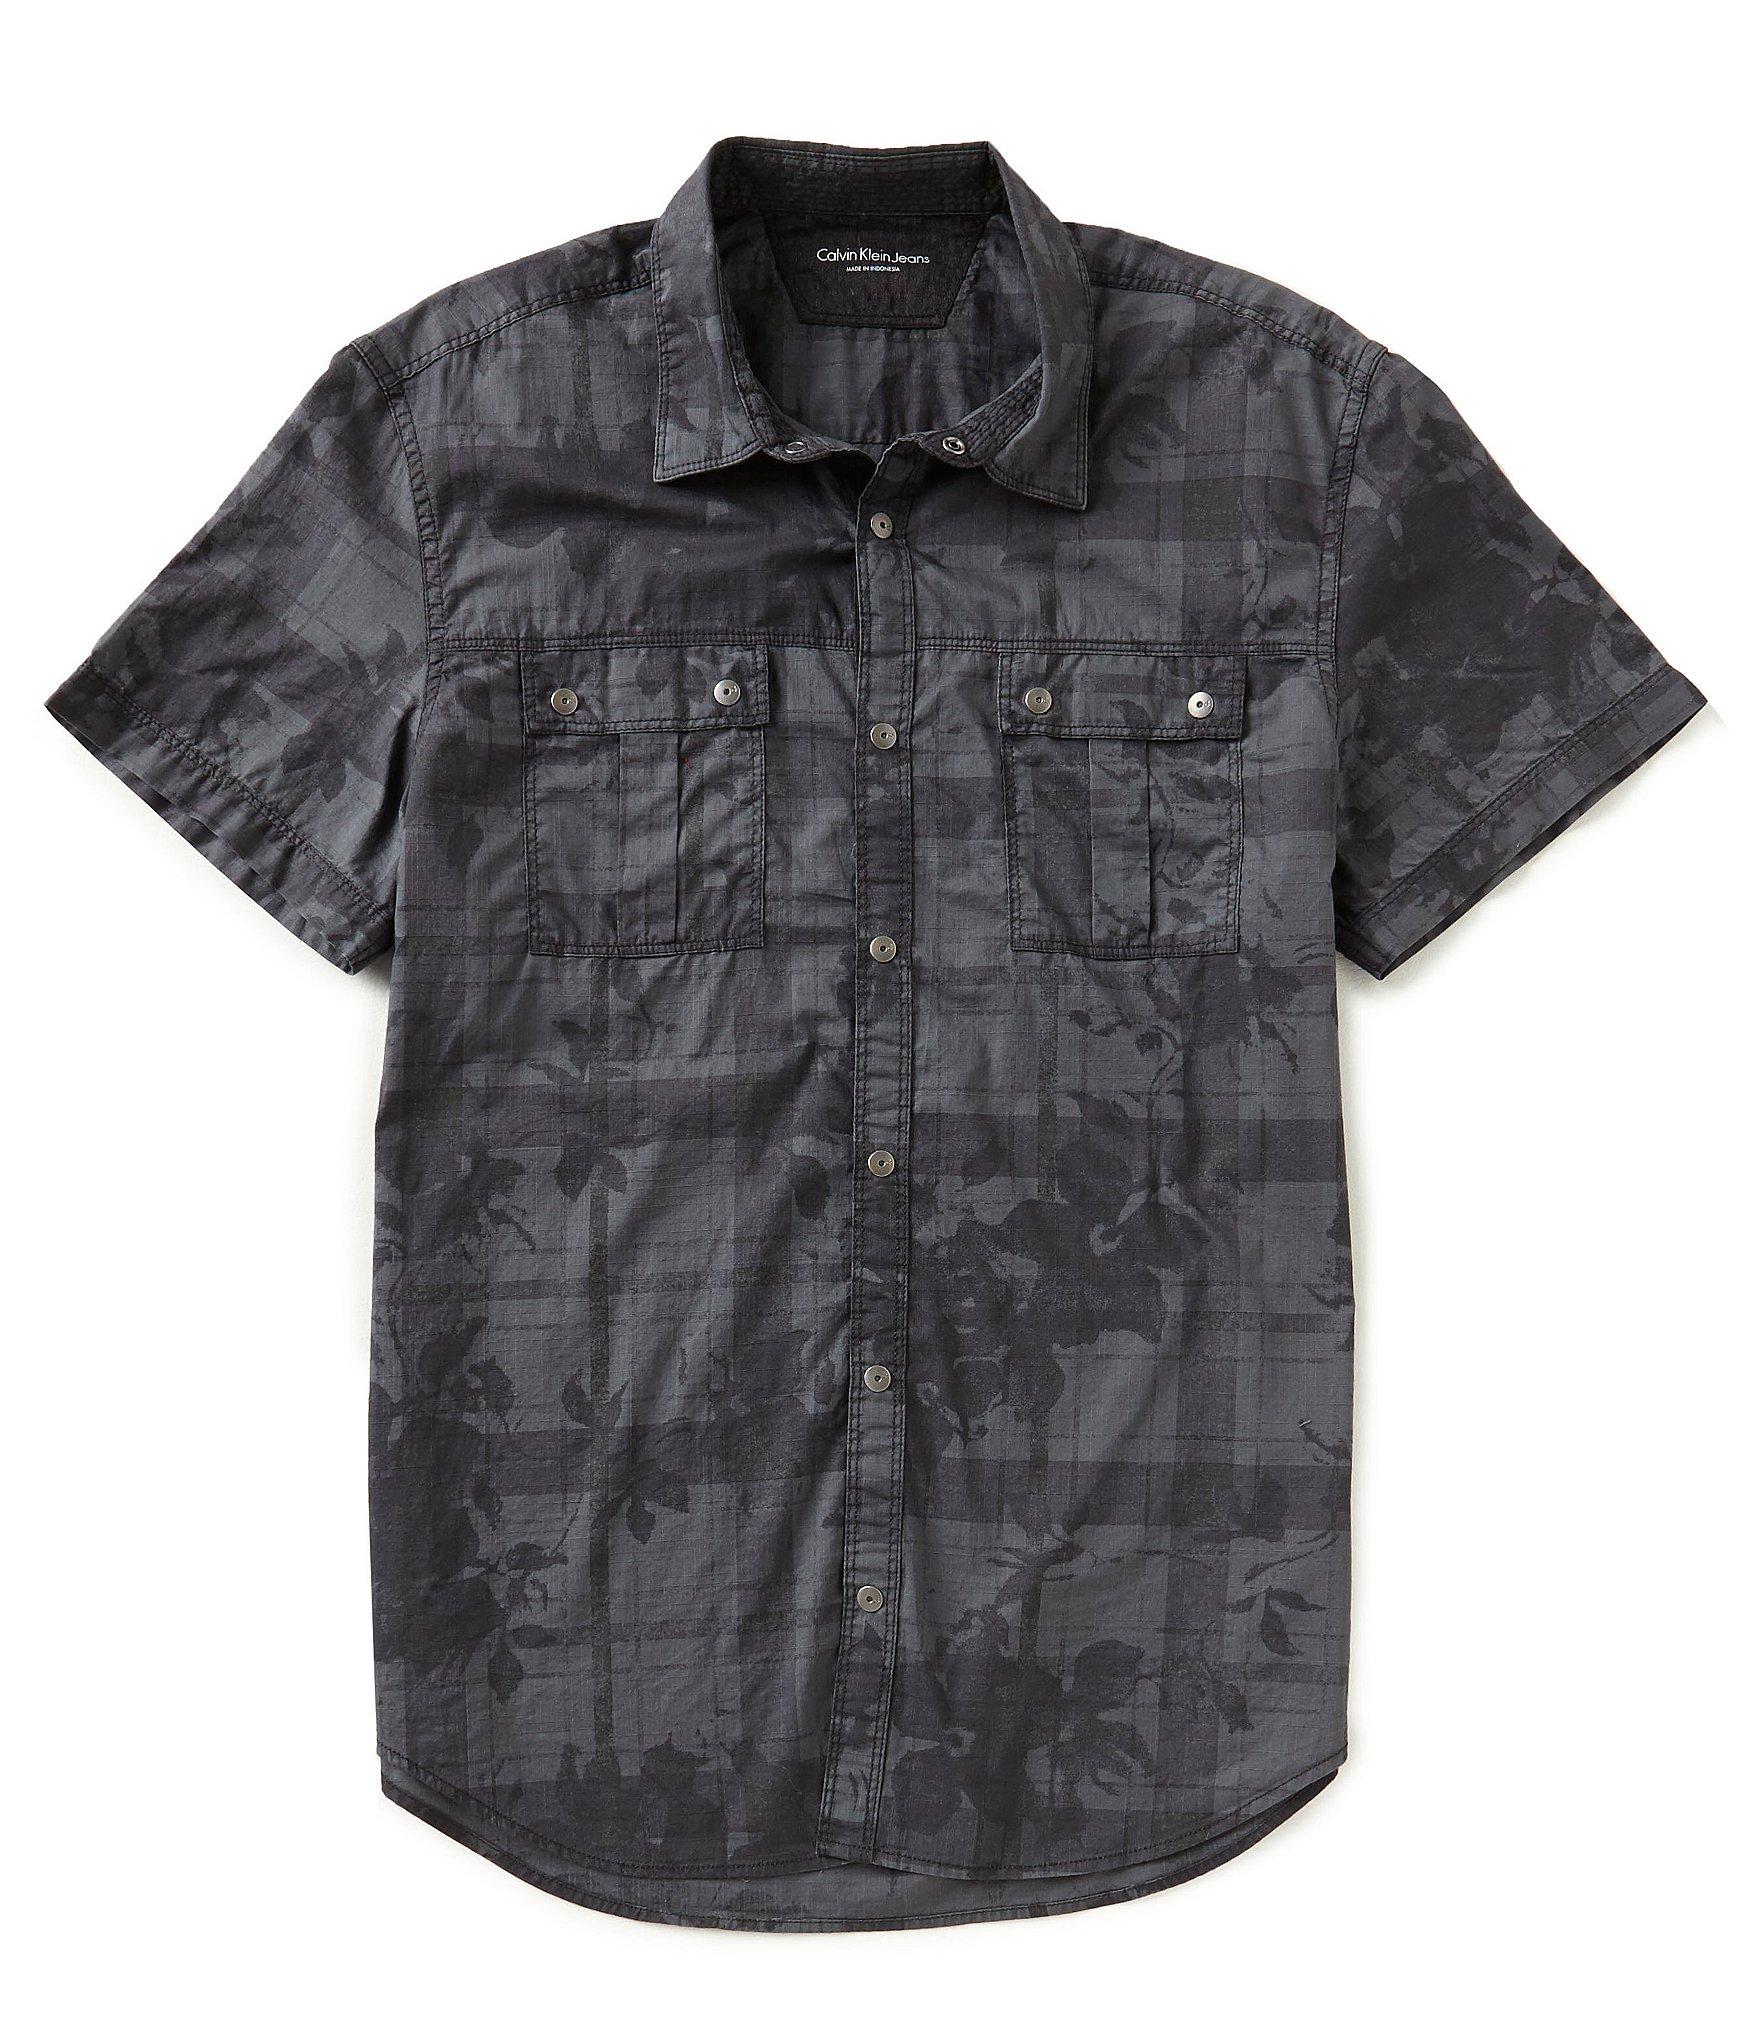 calvin klein jeans short sleeve floral plaid print shirt. Black Bedroom Furniture Sets. Home Design Ideas